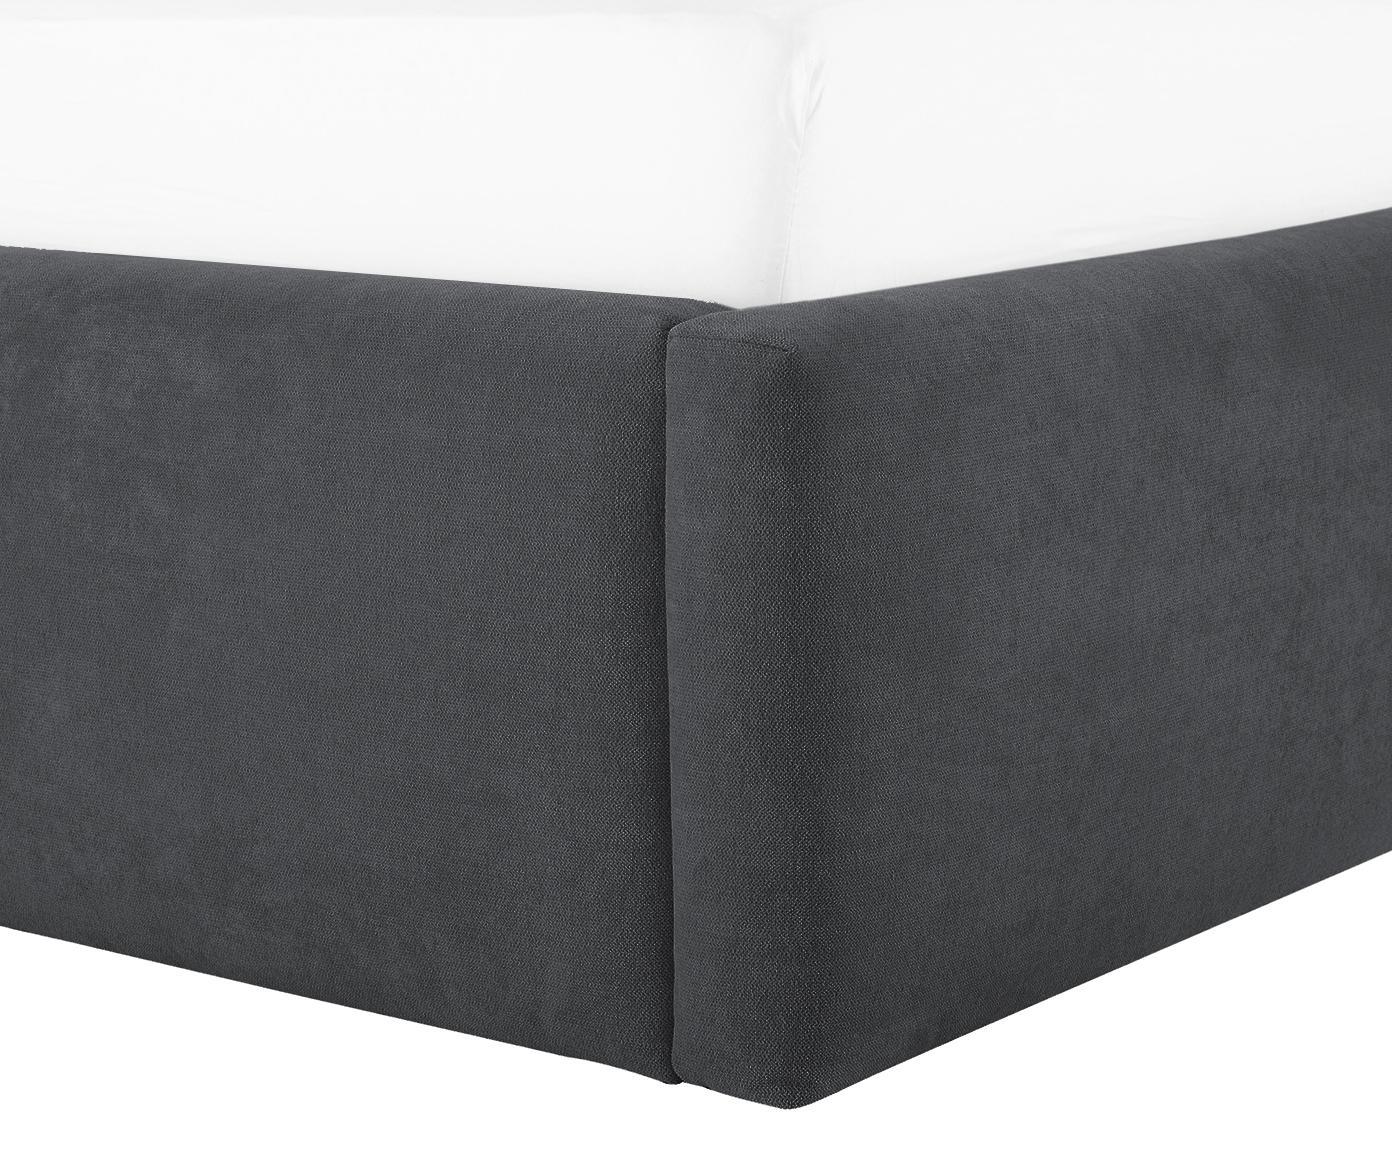 Polsterbett Star, Korpus: Massives Kiefernholz, Bezug: Polyester (Strukturstoff), Webstoff Dunkelgrau, 180 x 200 cm